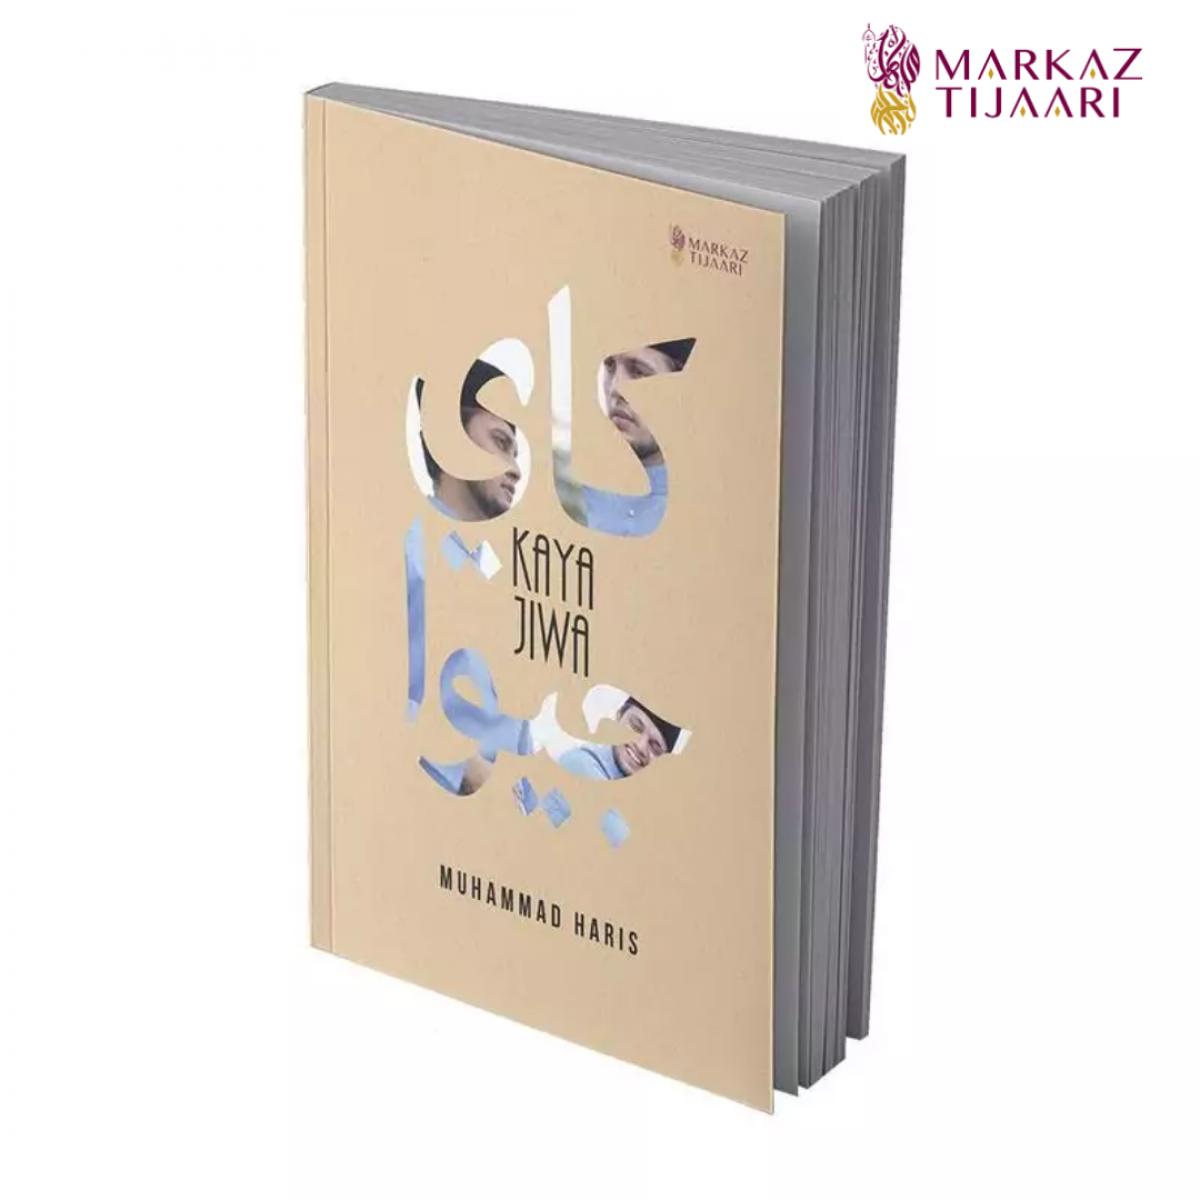 Buku Kaya Jiwa - MARKAZ TIJAARI